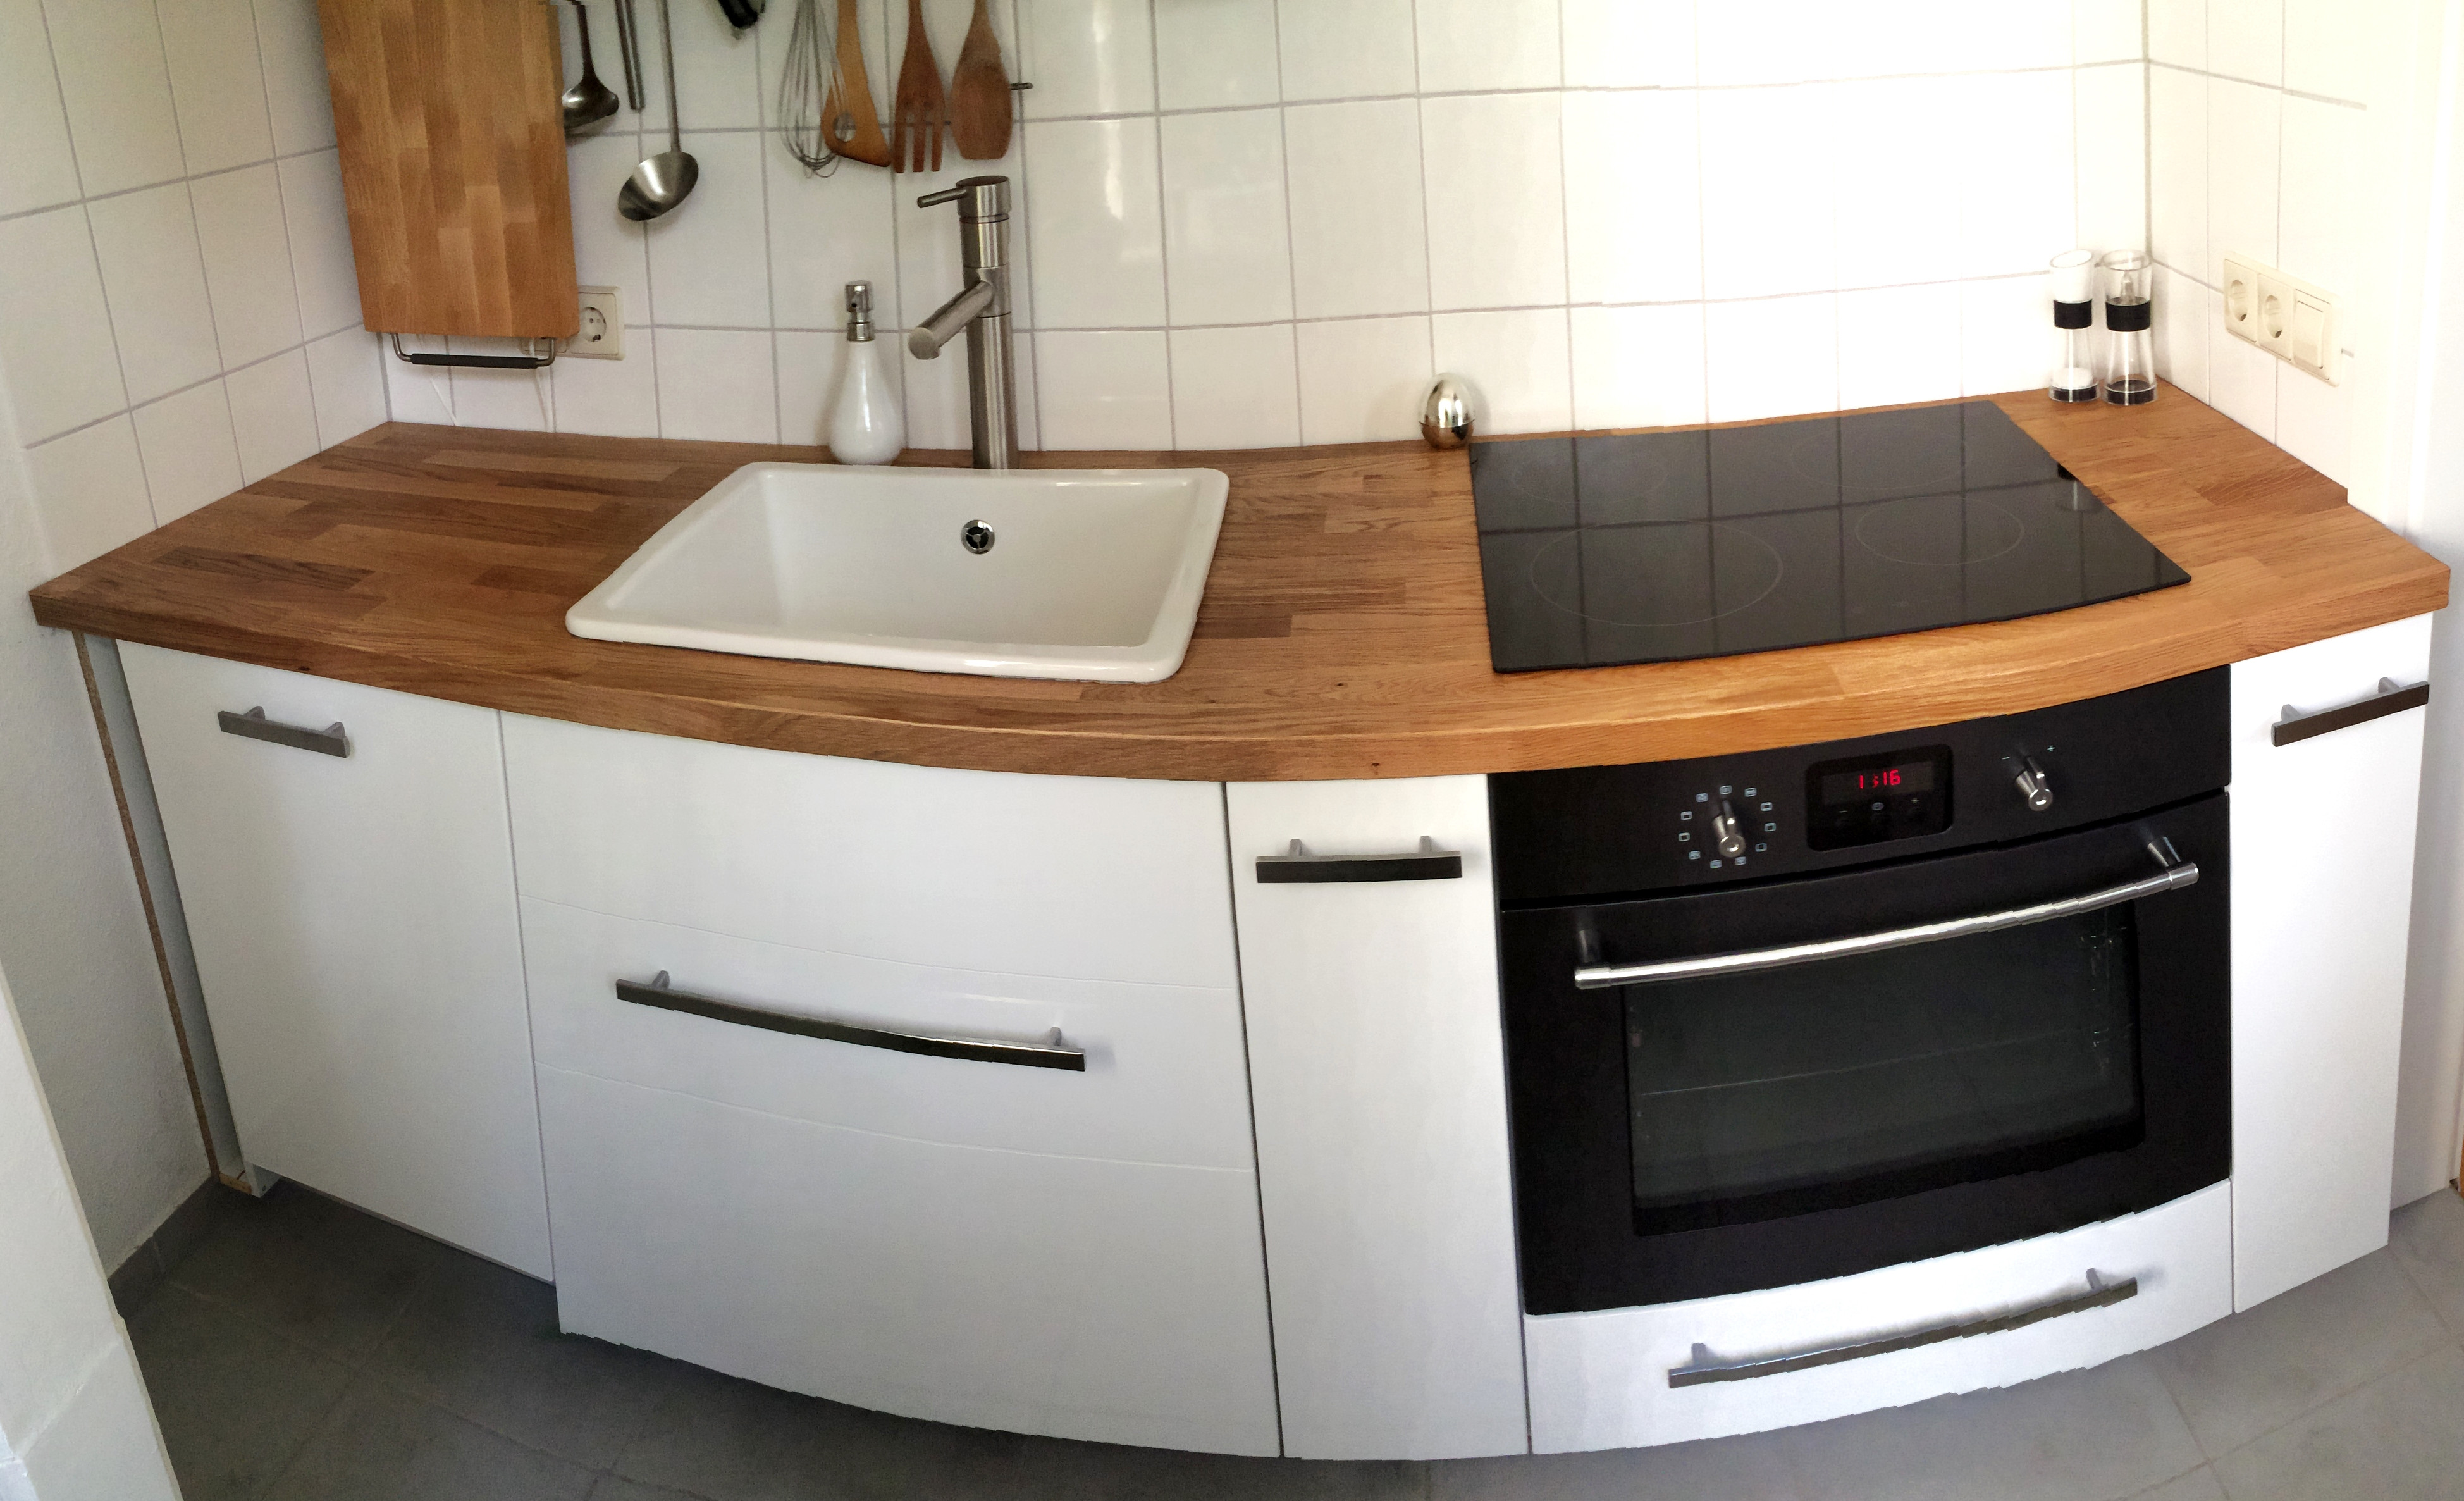 Ikea Küche Metod  Unsere erste IKEA Küche